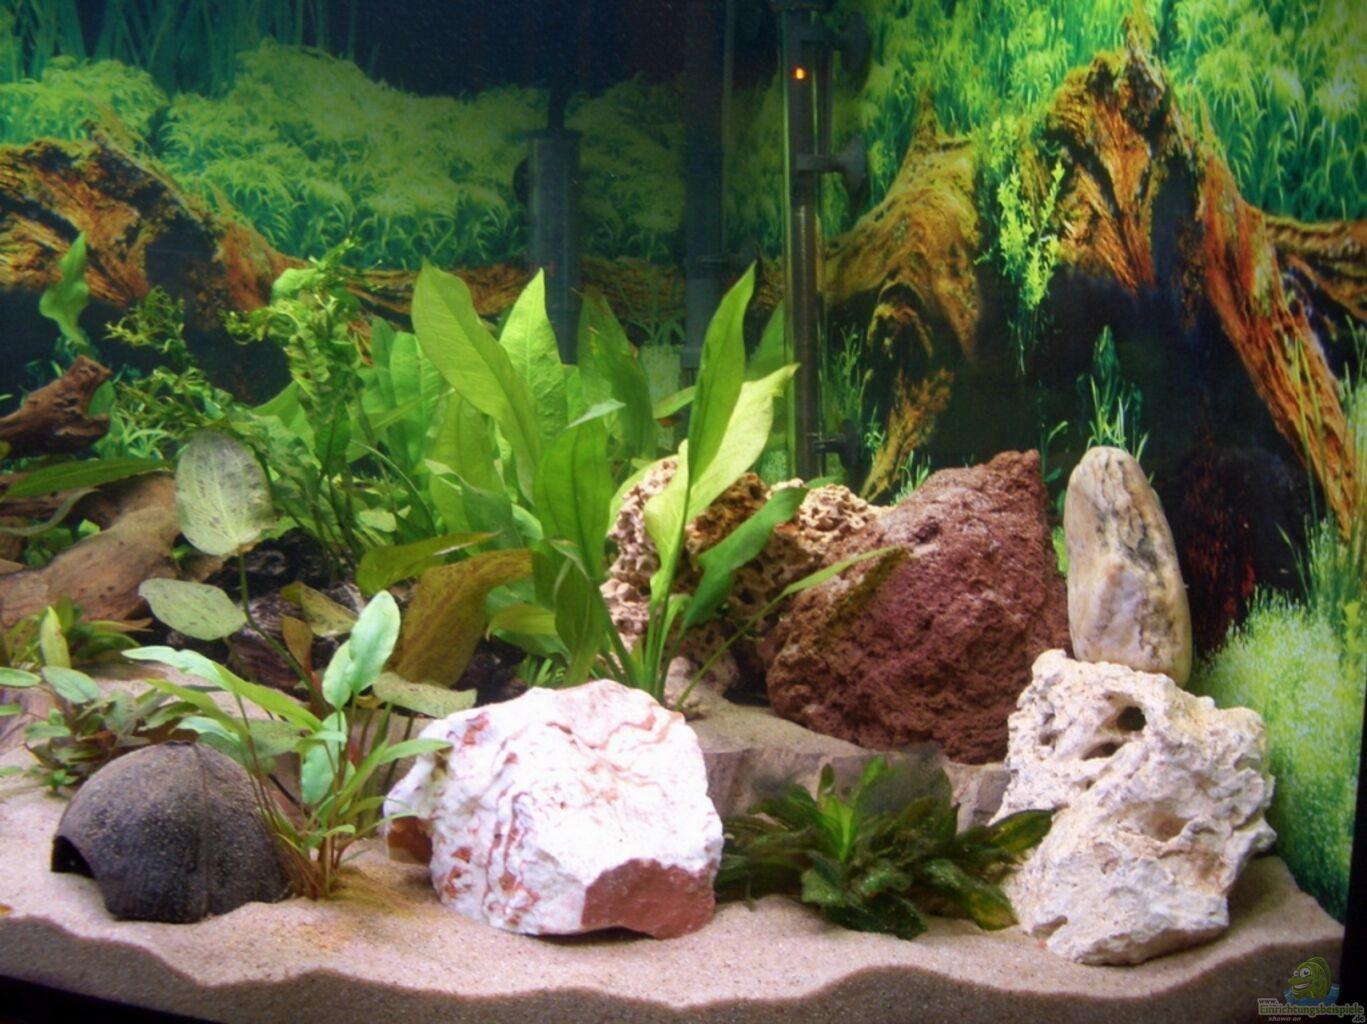 jad cw 182 dekorativer luftausstr mer krokodil aquarium deko l 26cm mit anschluss f r. Black Bedroom Furniture Sets. Home Design Ideas